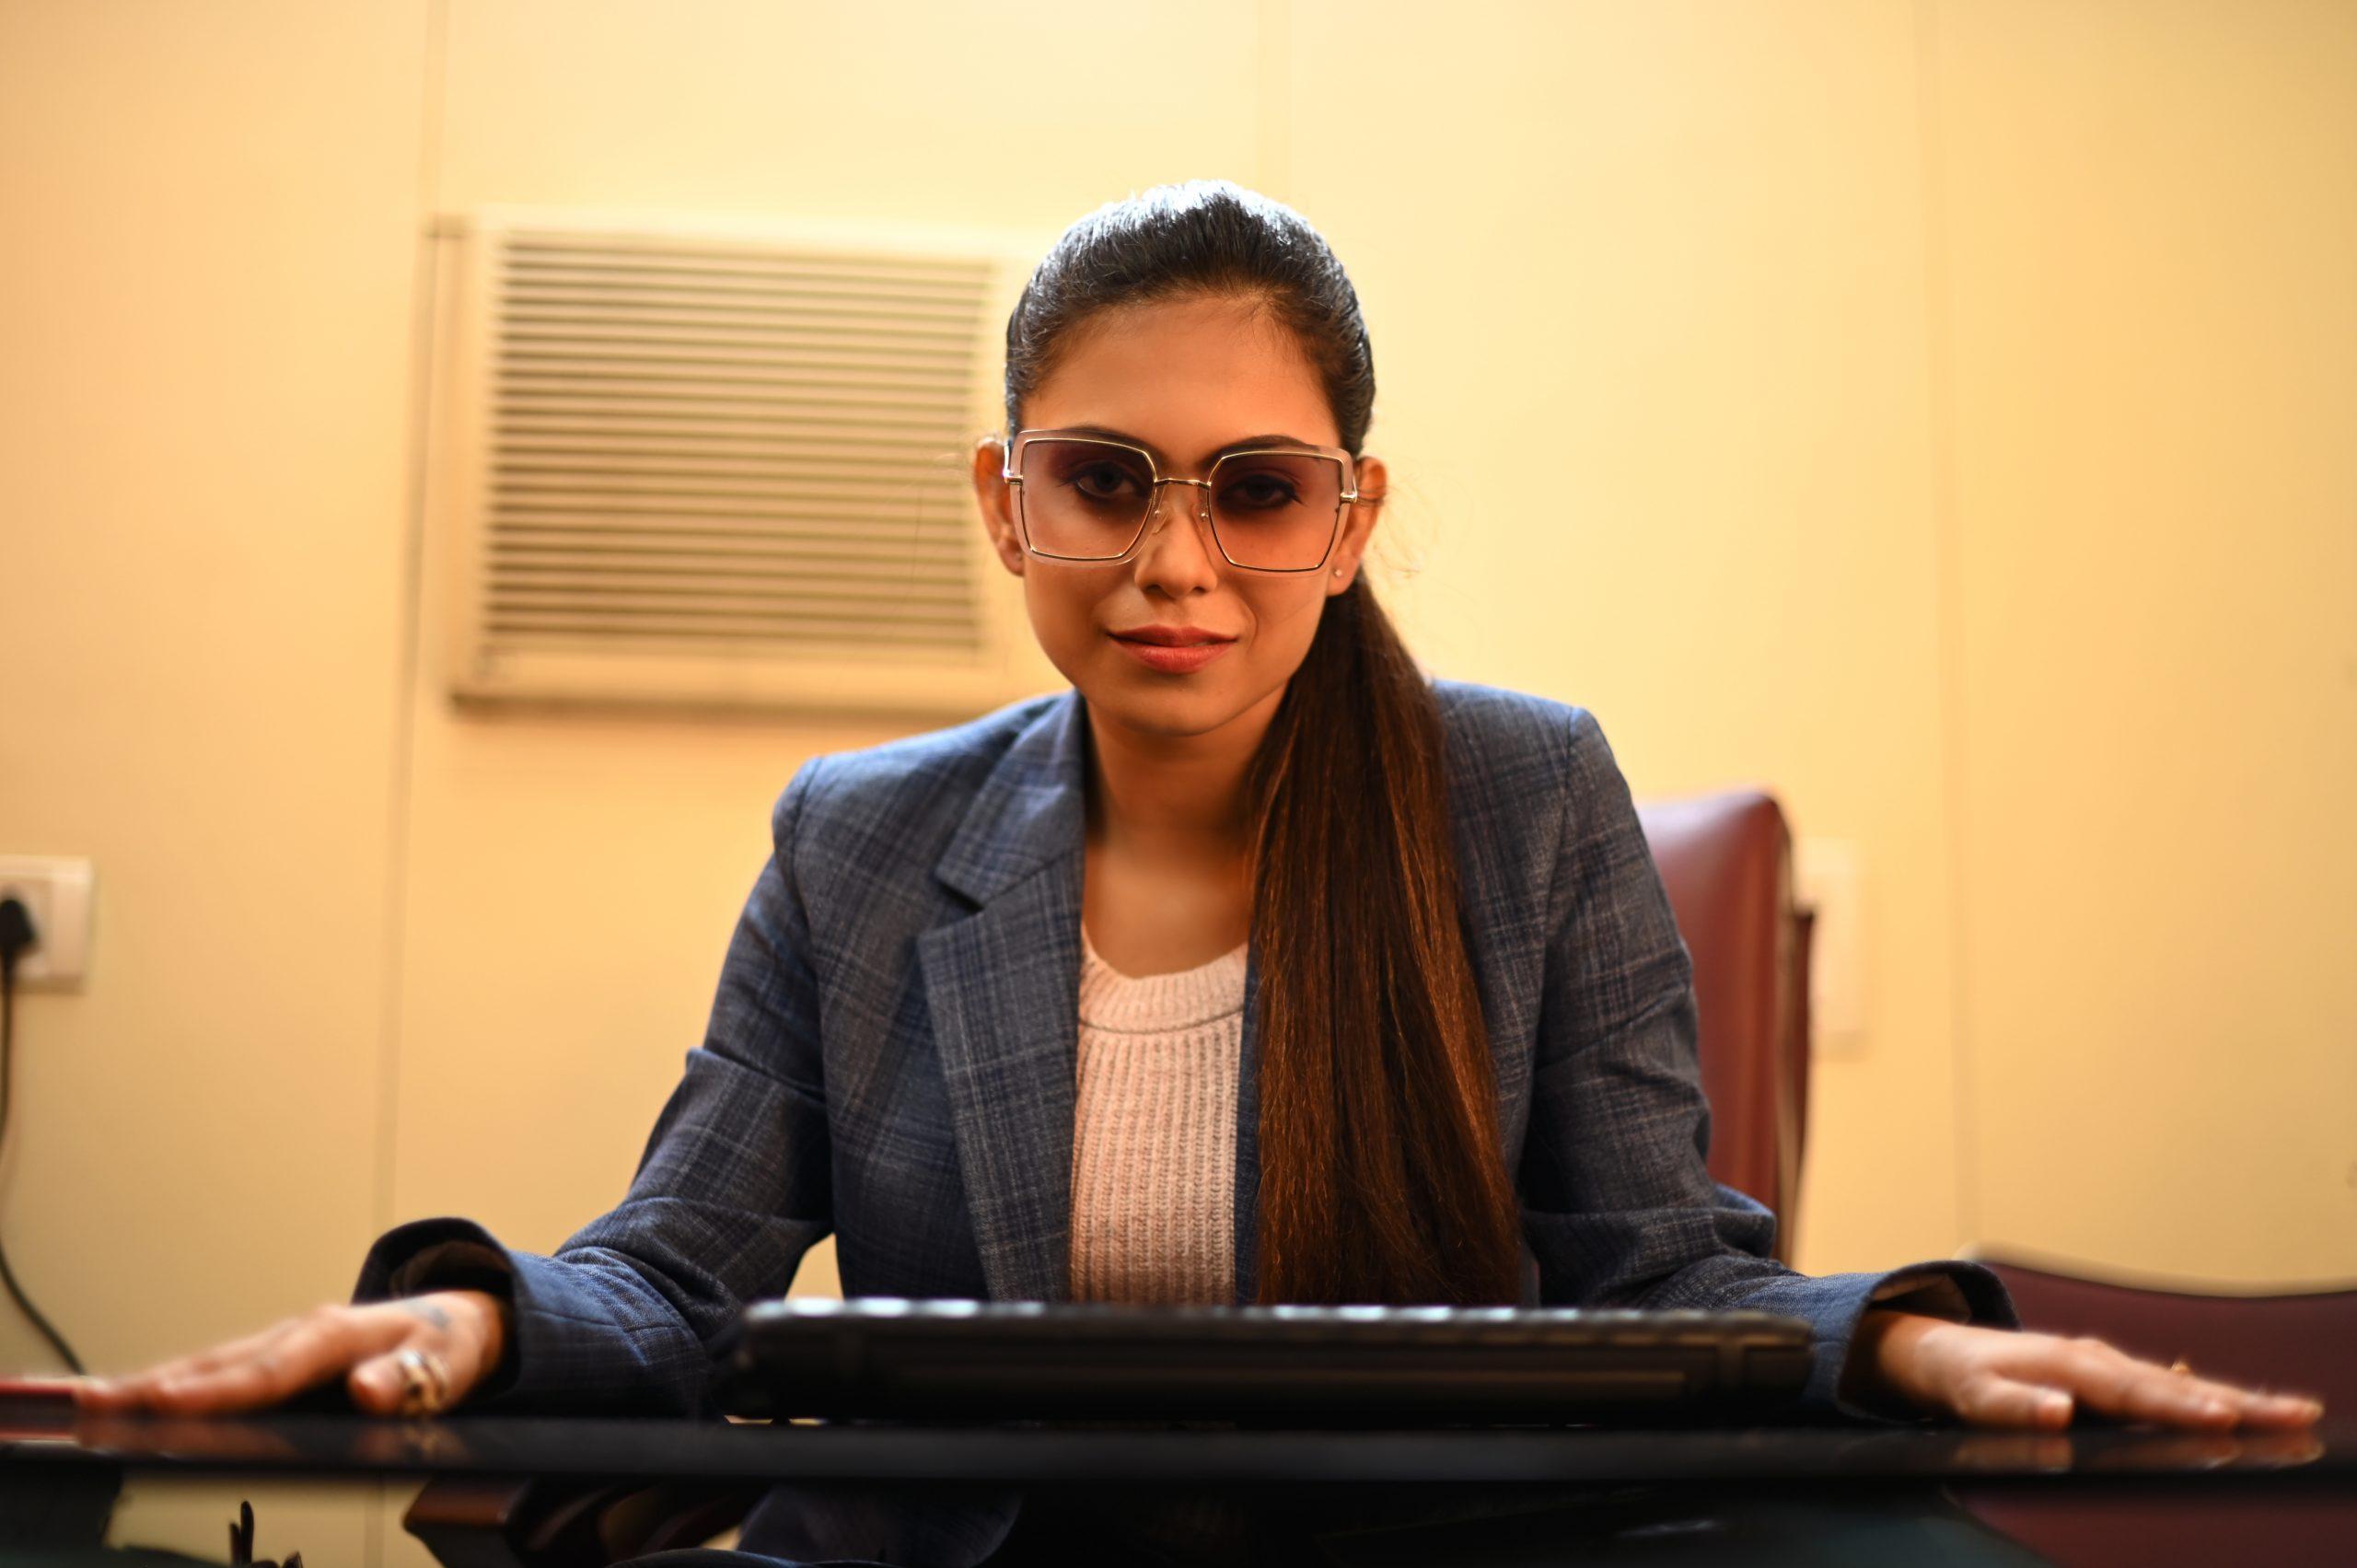 The Lady Boss